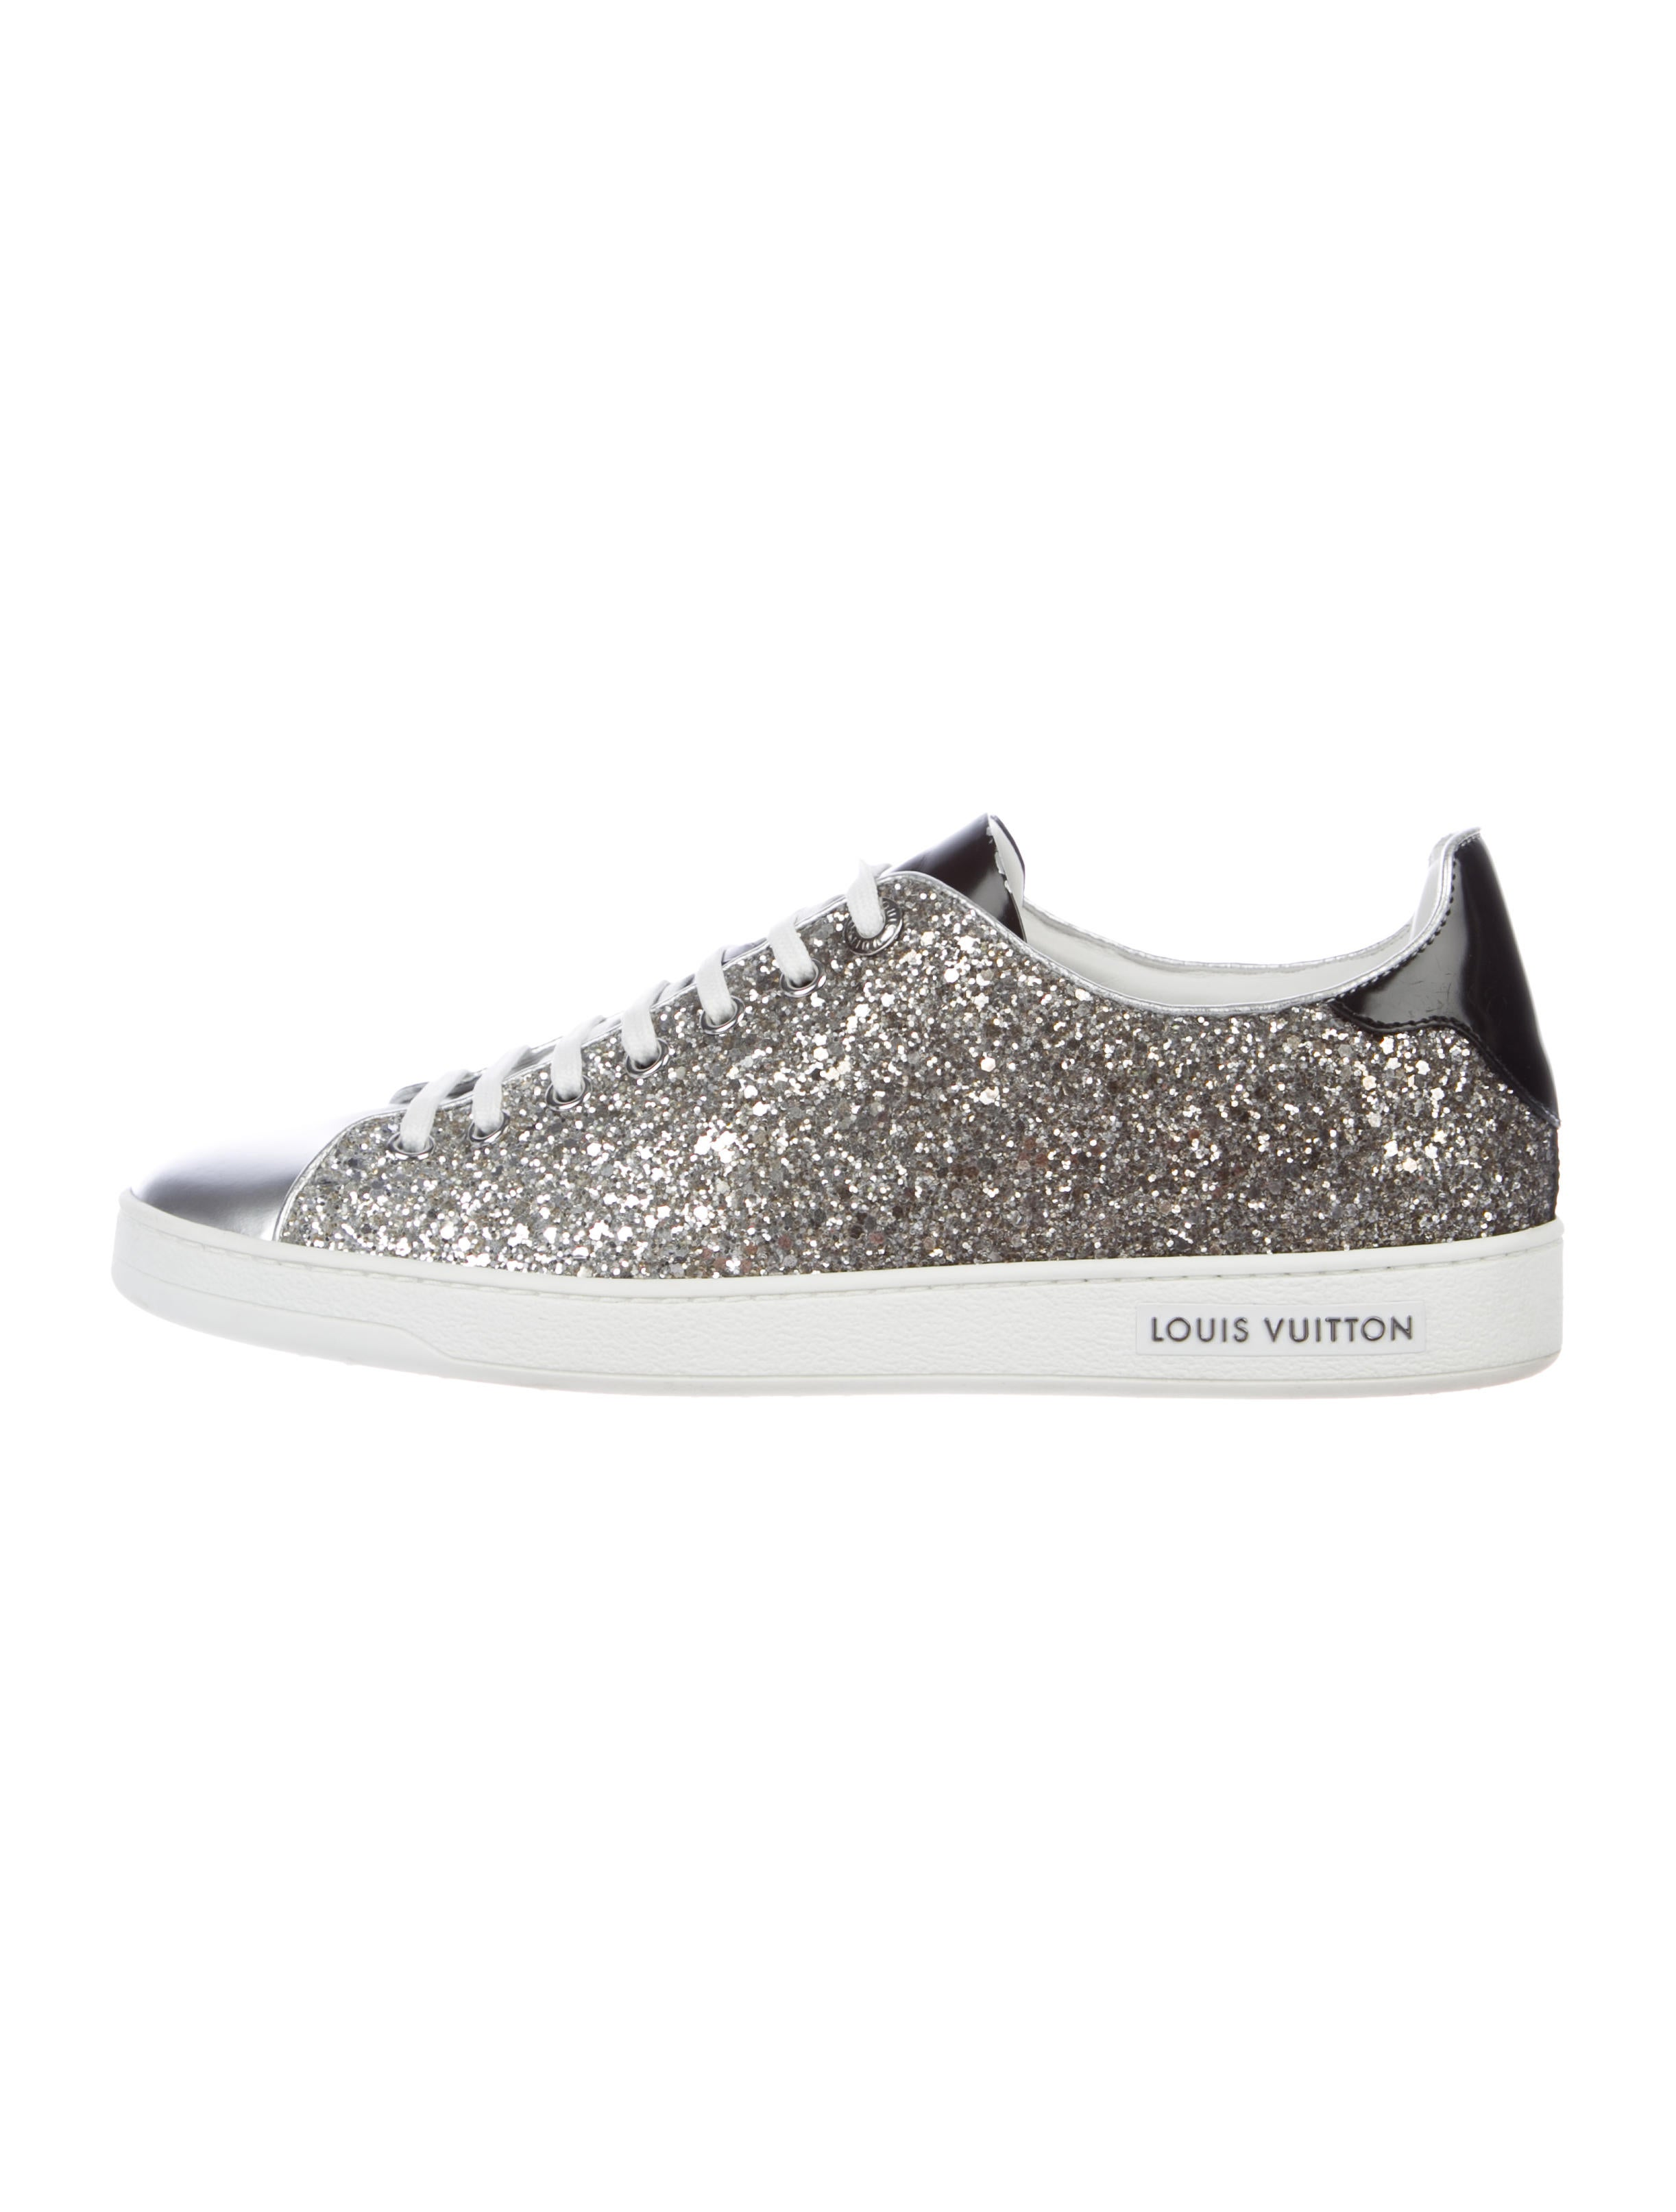 Louis Vuitton Glitter Low-Top Sneakers